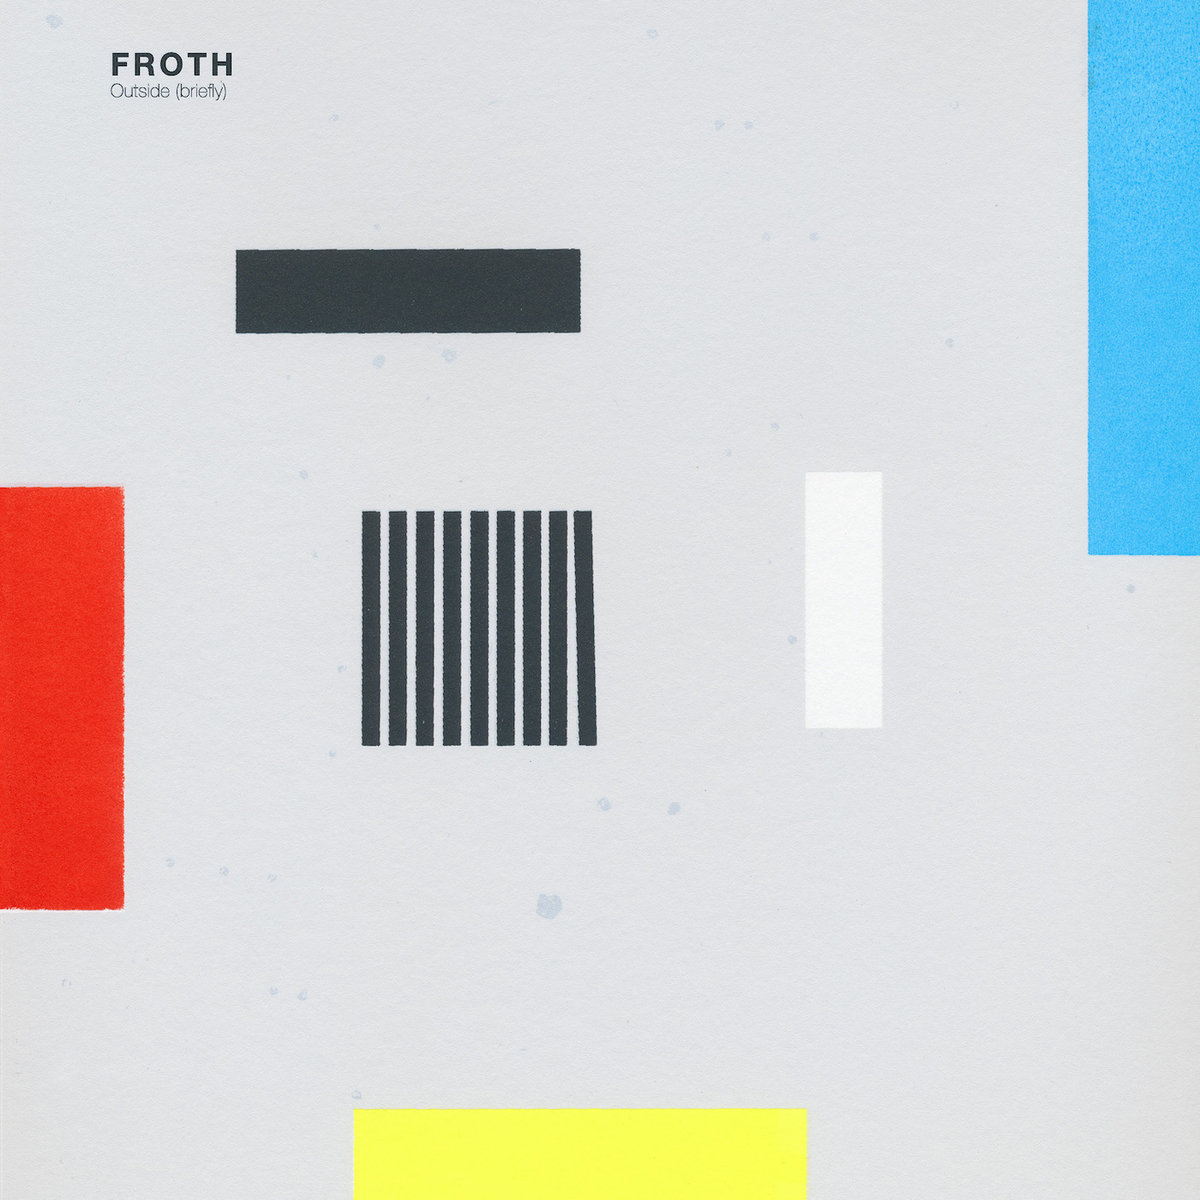 pochette-Froth